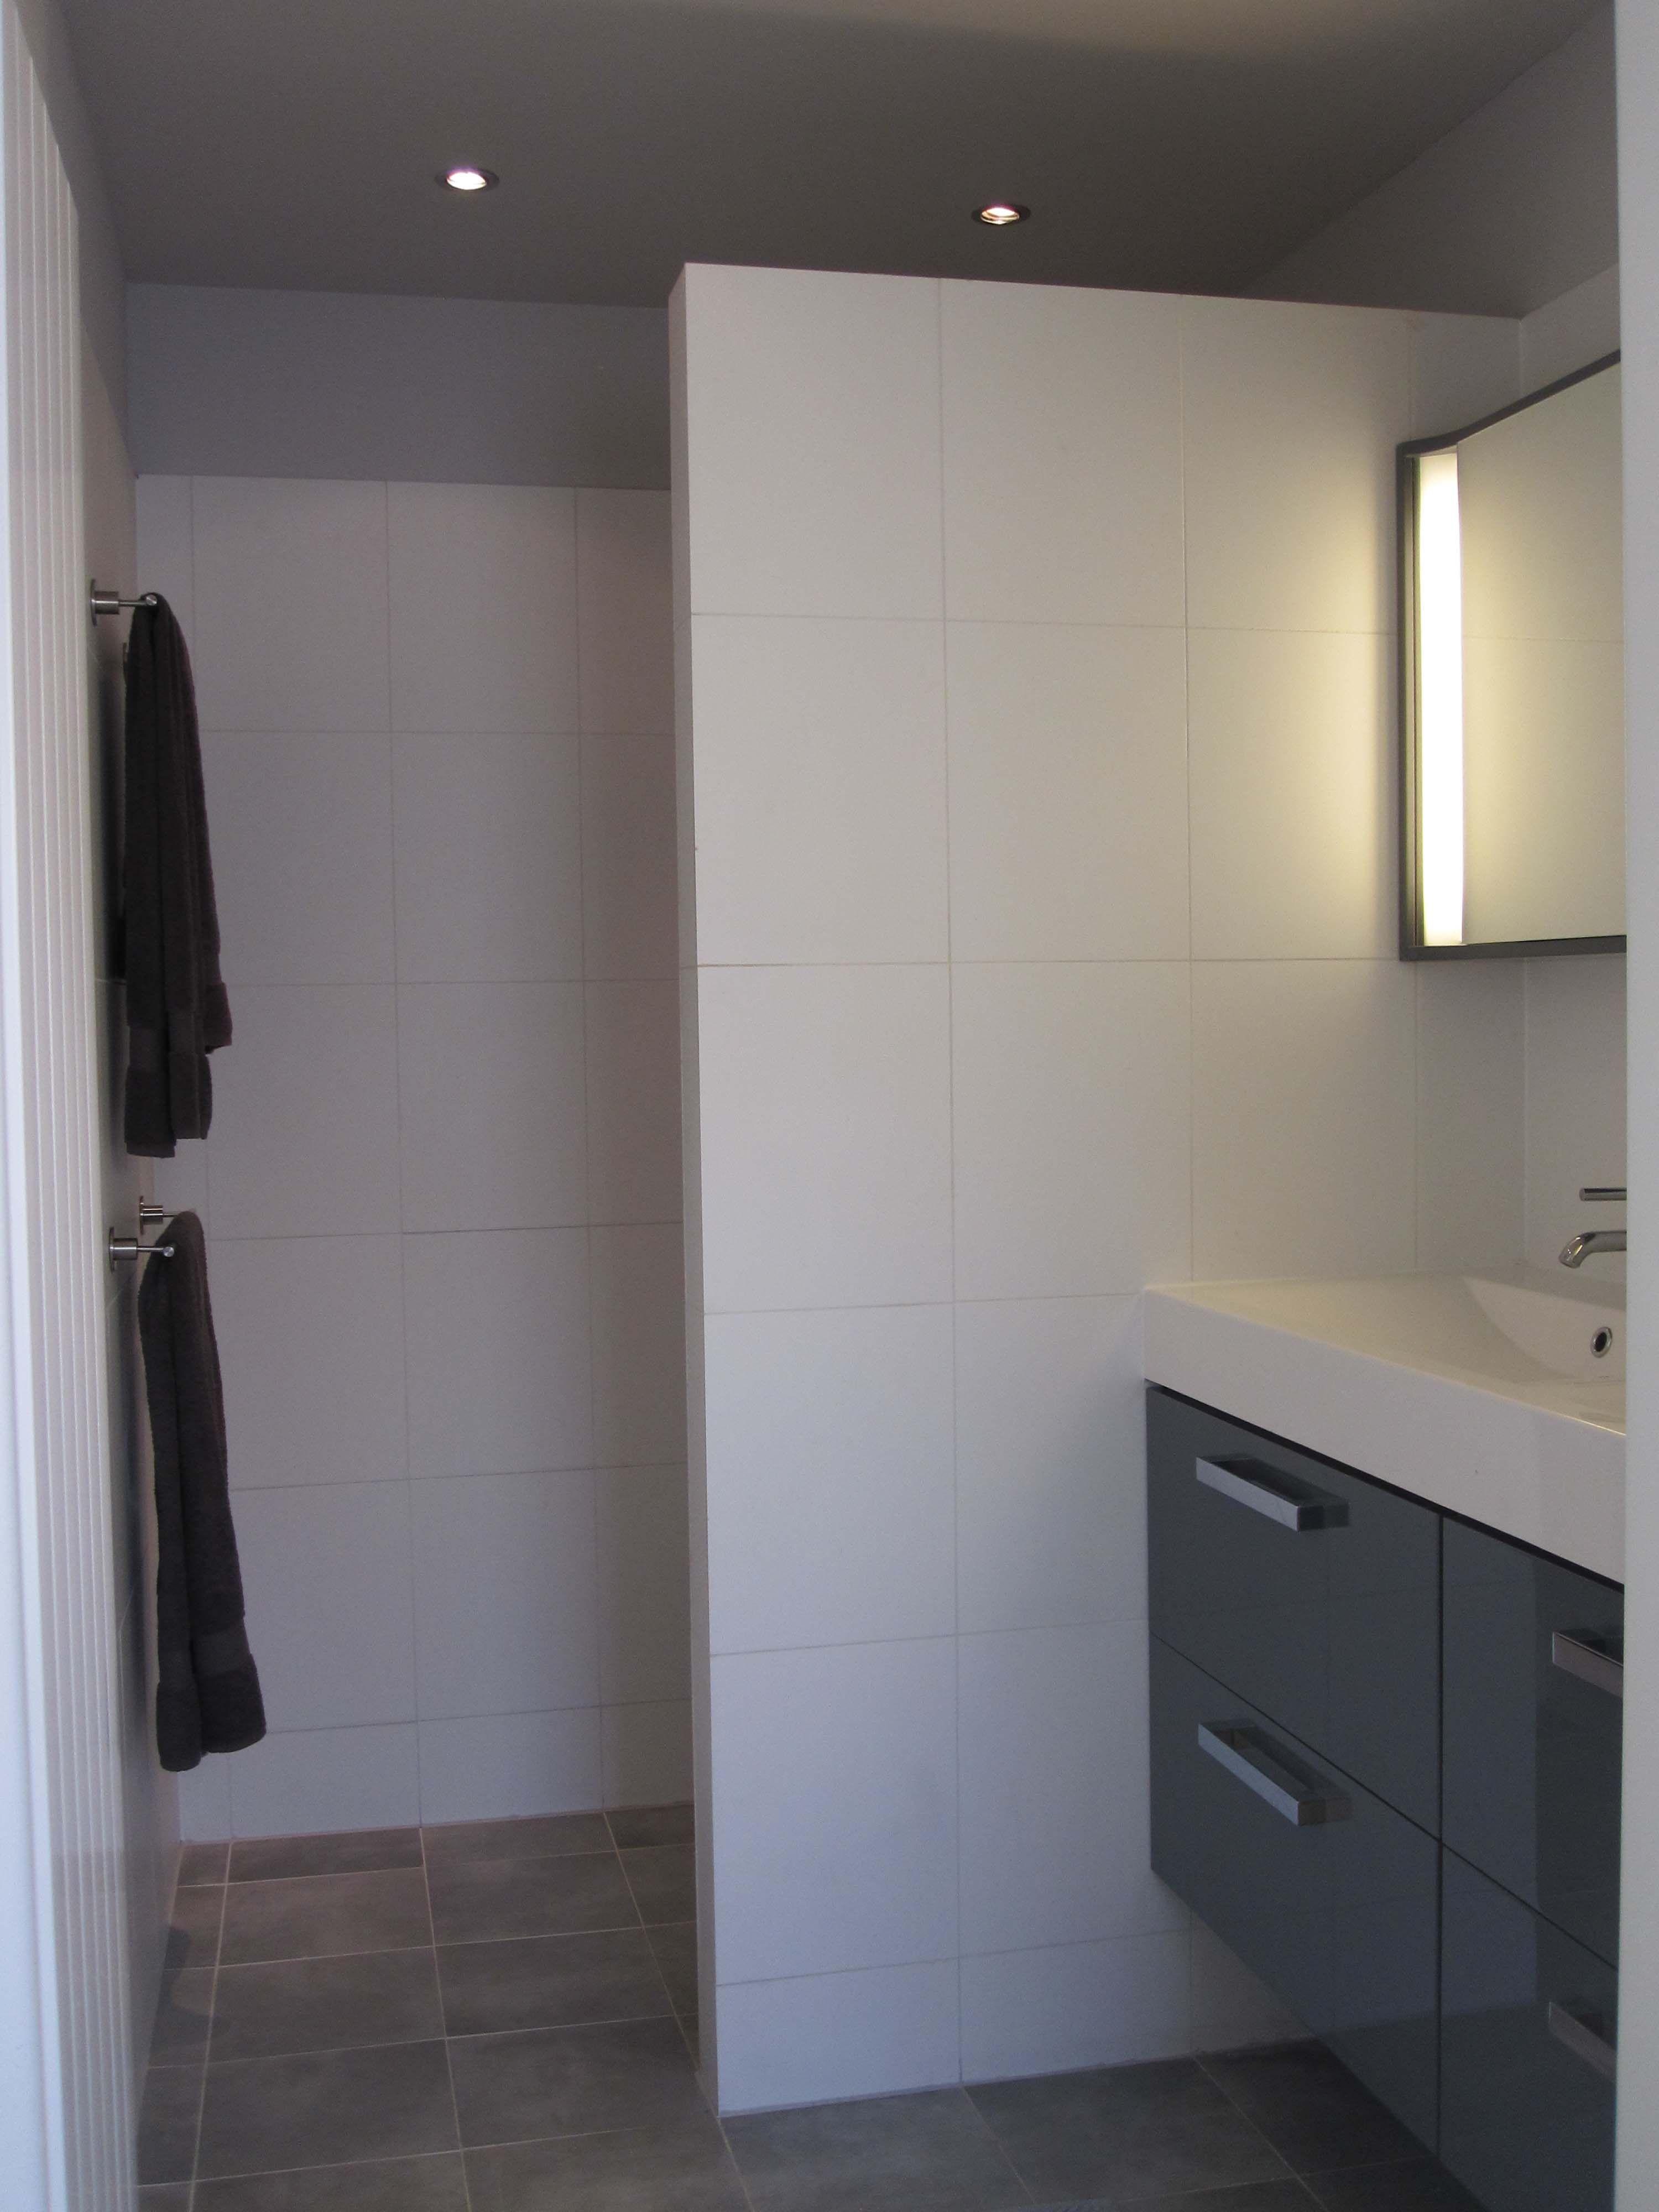 inloopdouche badkamer Amsterdam | badkamer/toilet | Pinterest ...